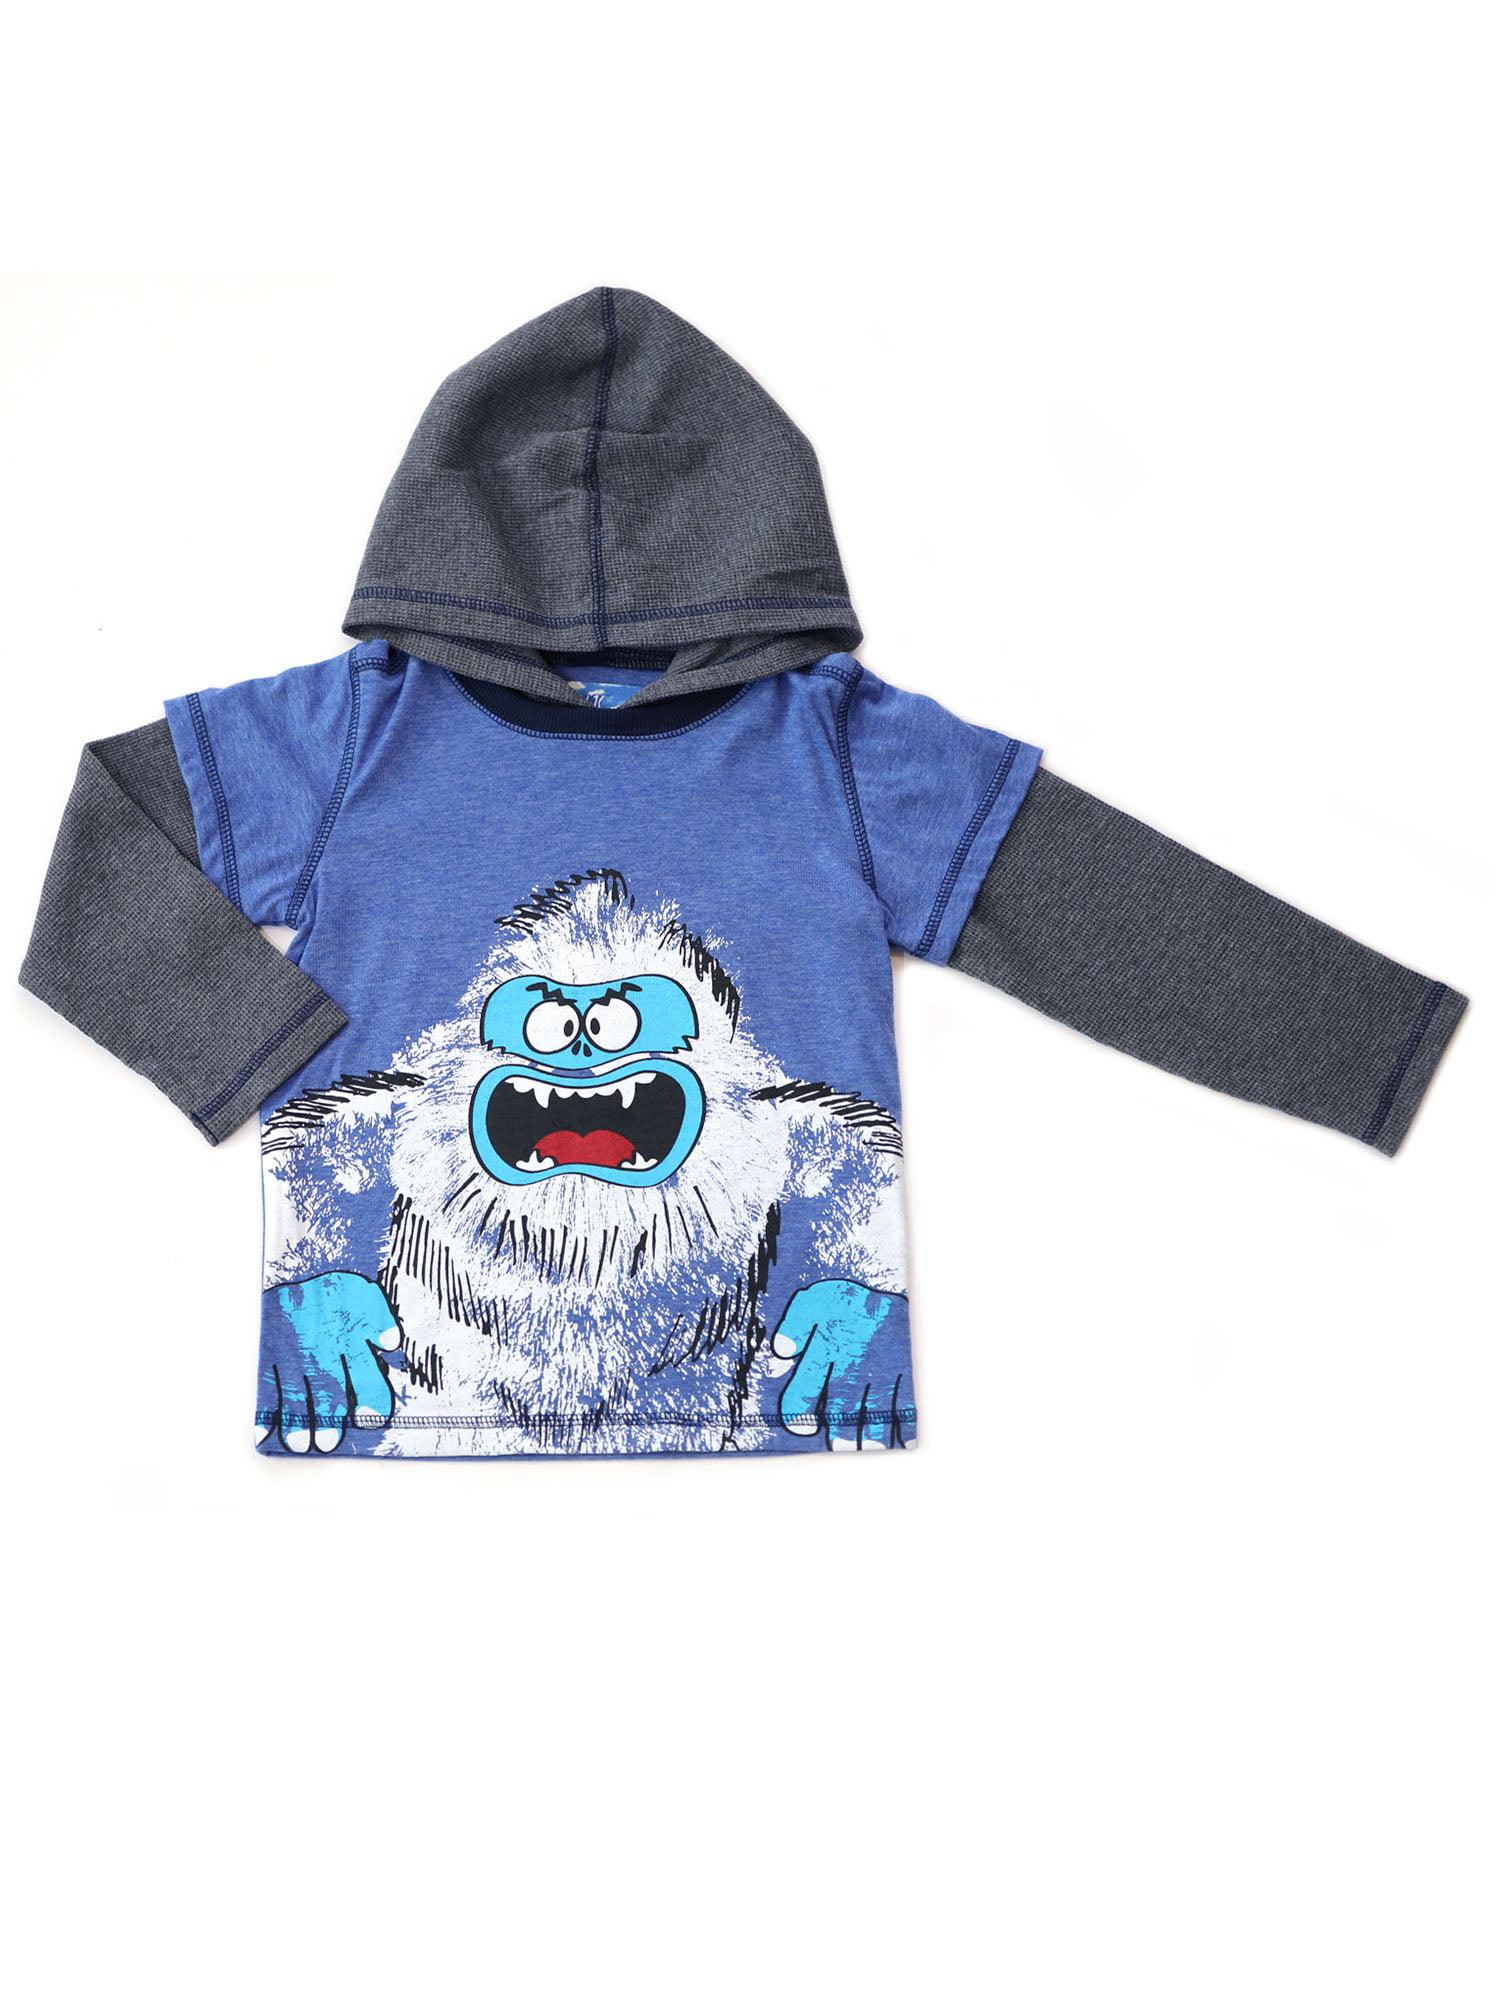 Kapital K Yeti Hooded Layered Long Sleeve T-shirt (Baby Boys and Toddler Boys)